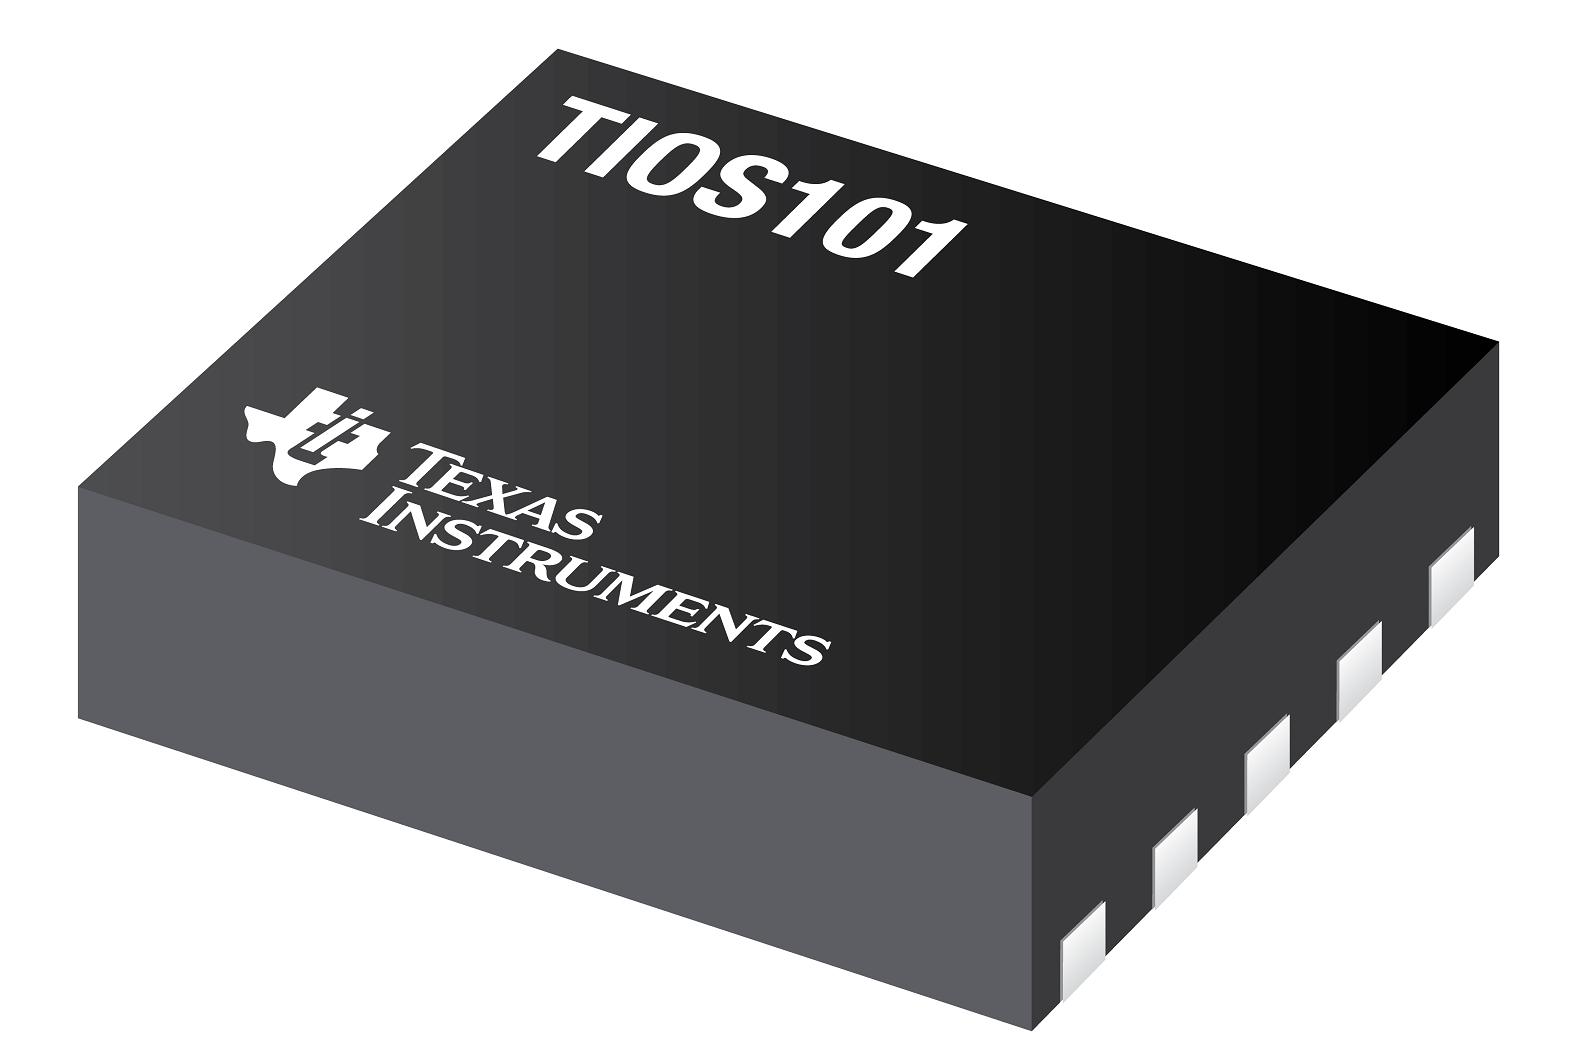 Texas Instruments TIOS101 chip.